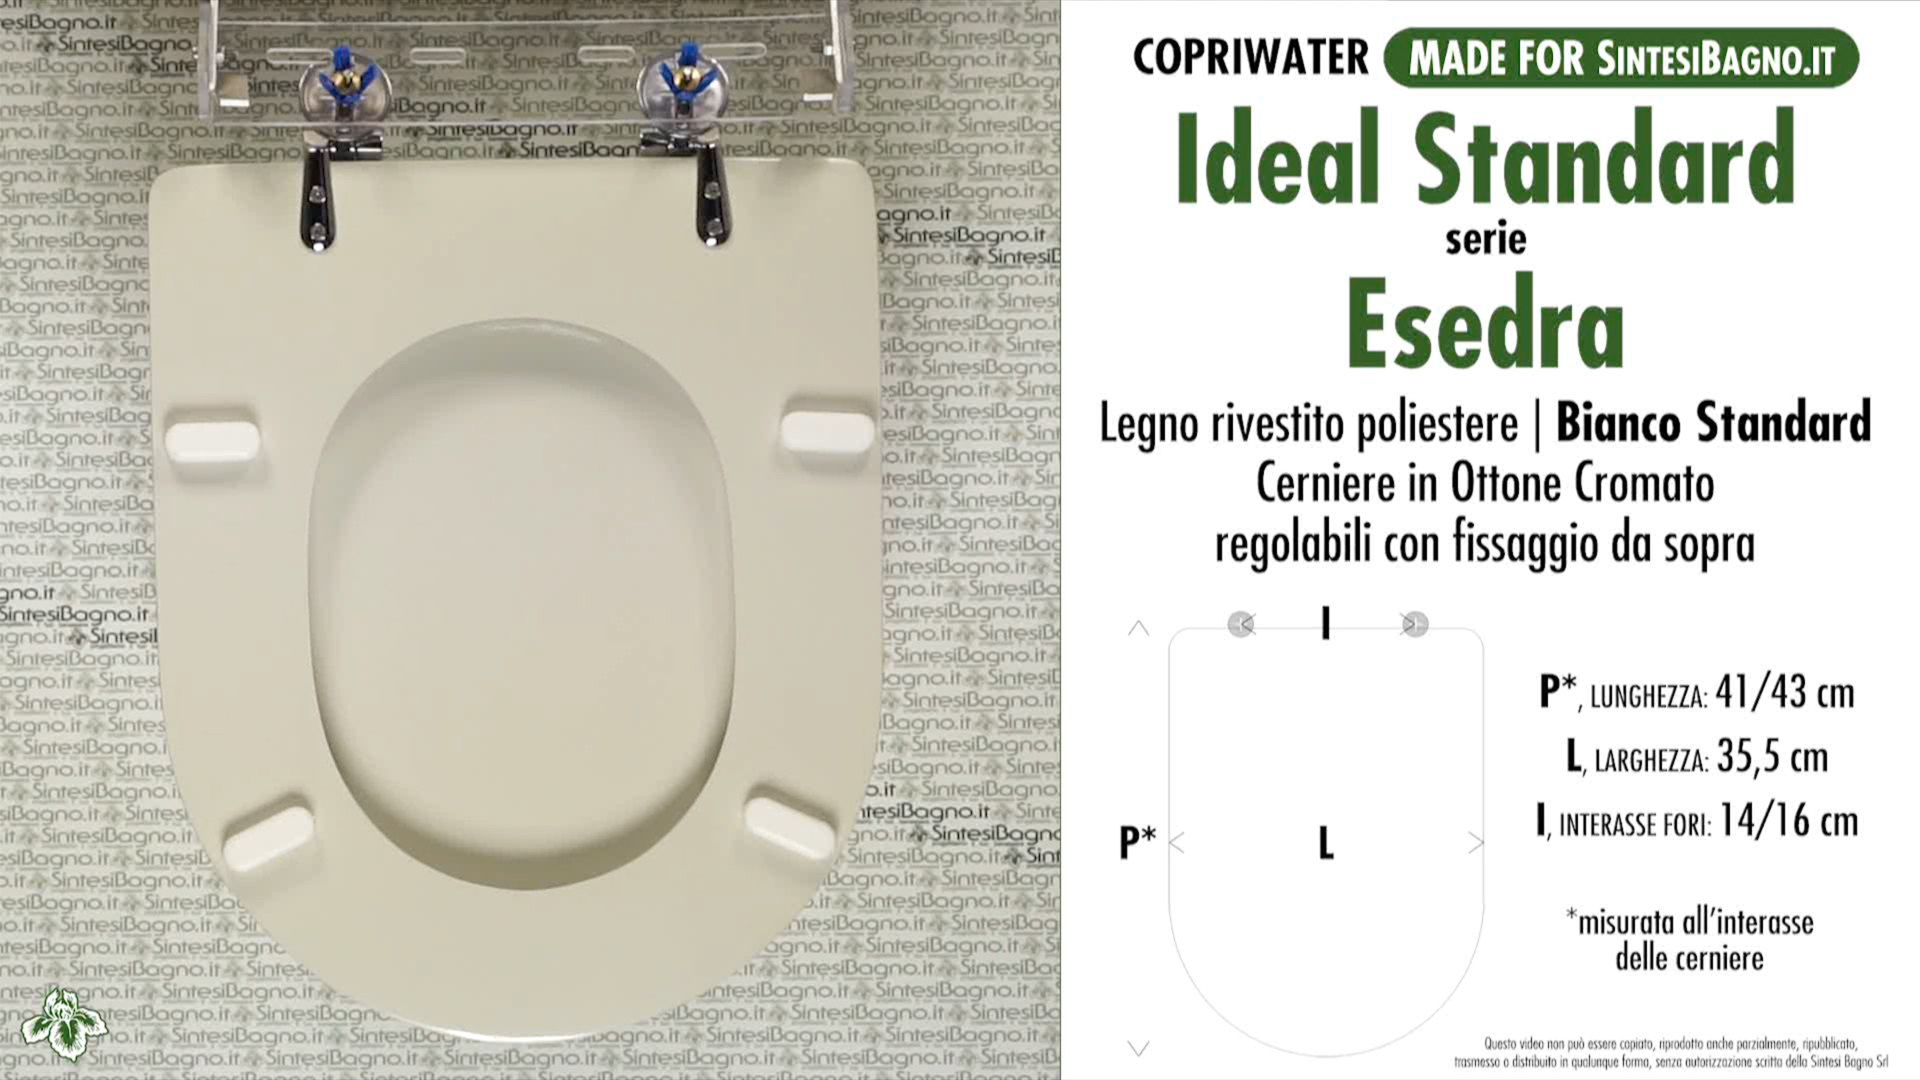 Serie Esedra Ideal Standard Of Copriwater Per Wc Esedra Ideal Standard Bianco Standard